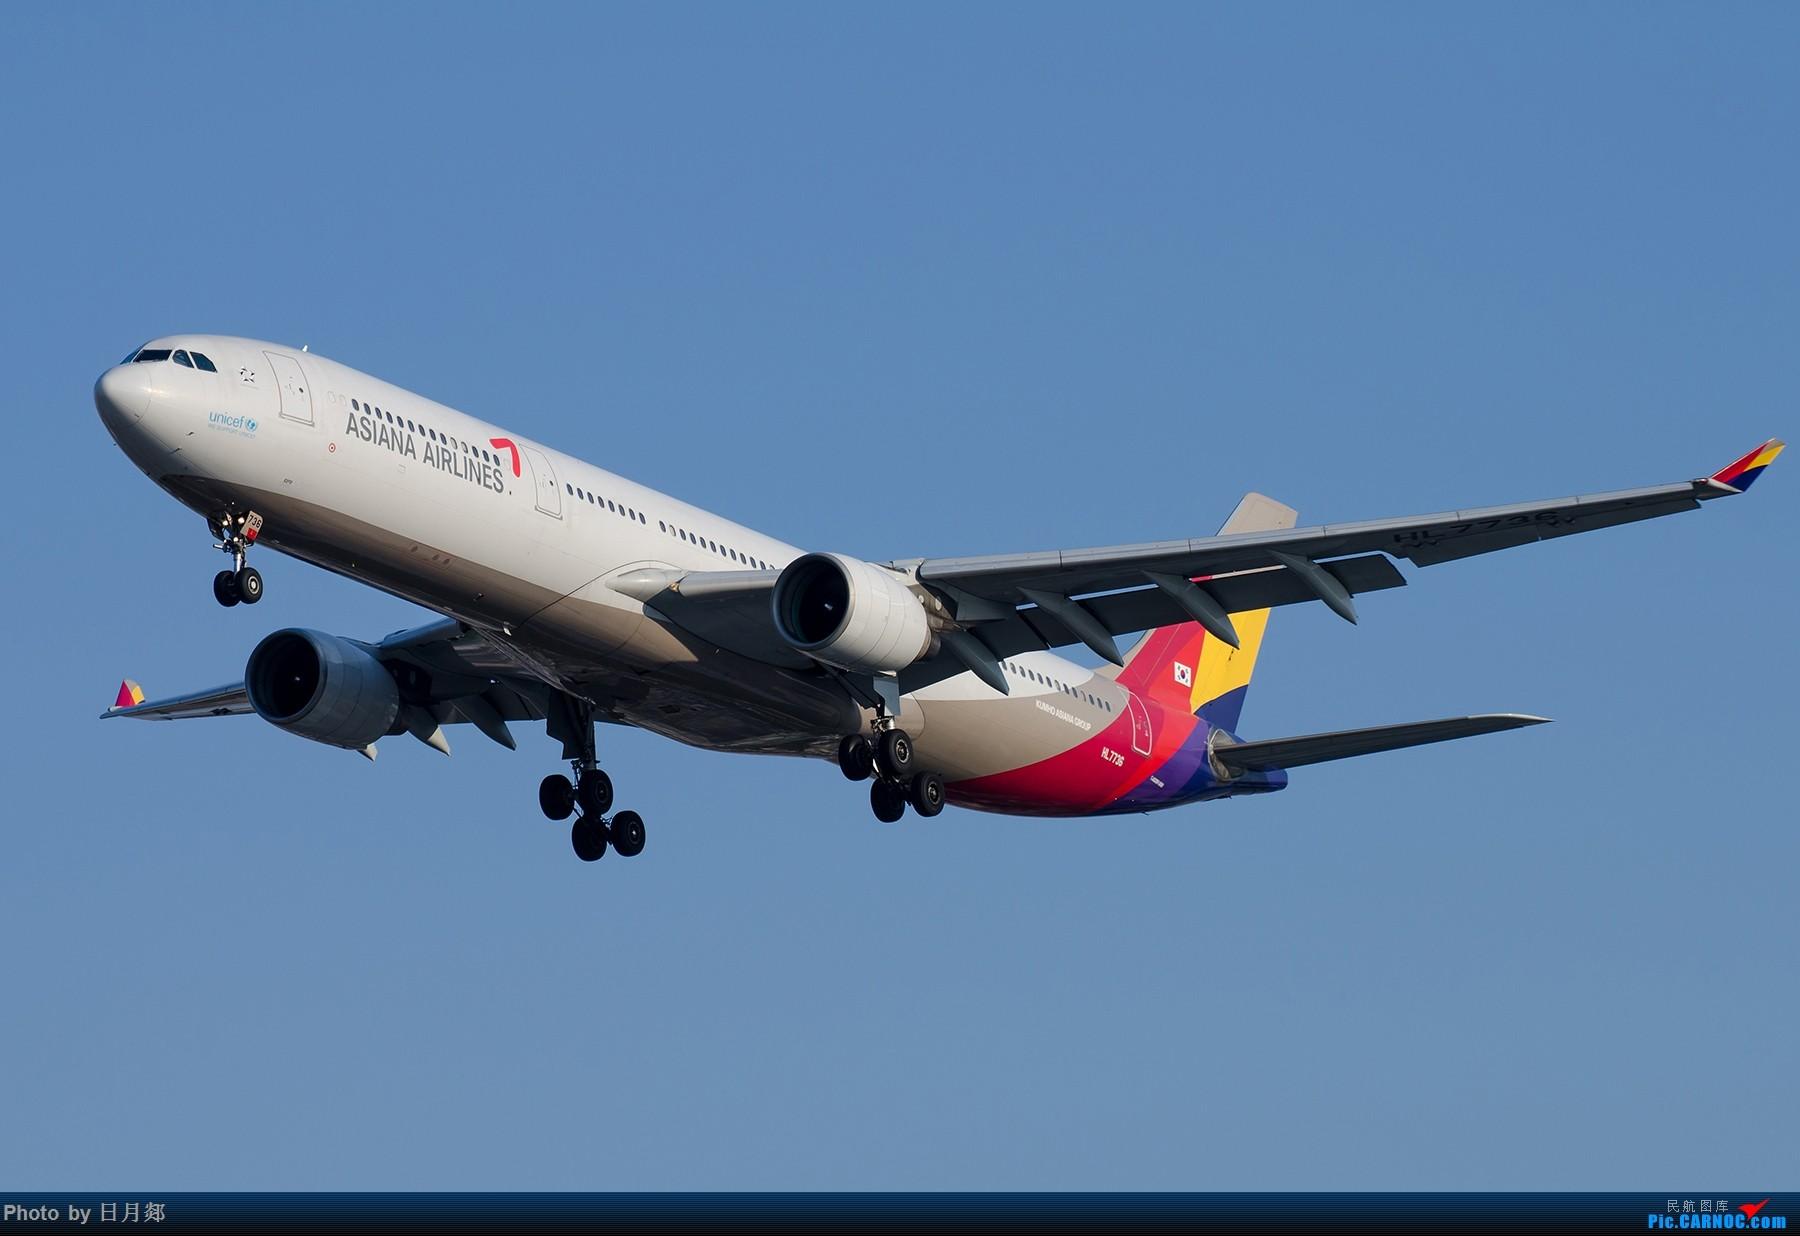 Re:[原创]【SHA拍机*1800大图】轻度污染来临前宝贵的蓝天,且拍且珍惜 AIRBUS A330-300 HL7736 中国上海虹桥国际机场